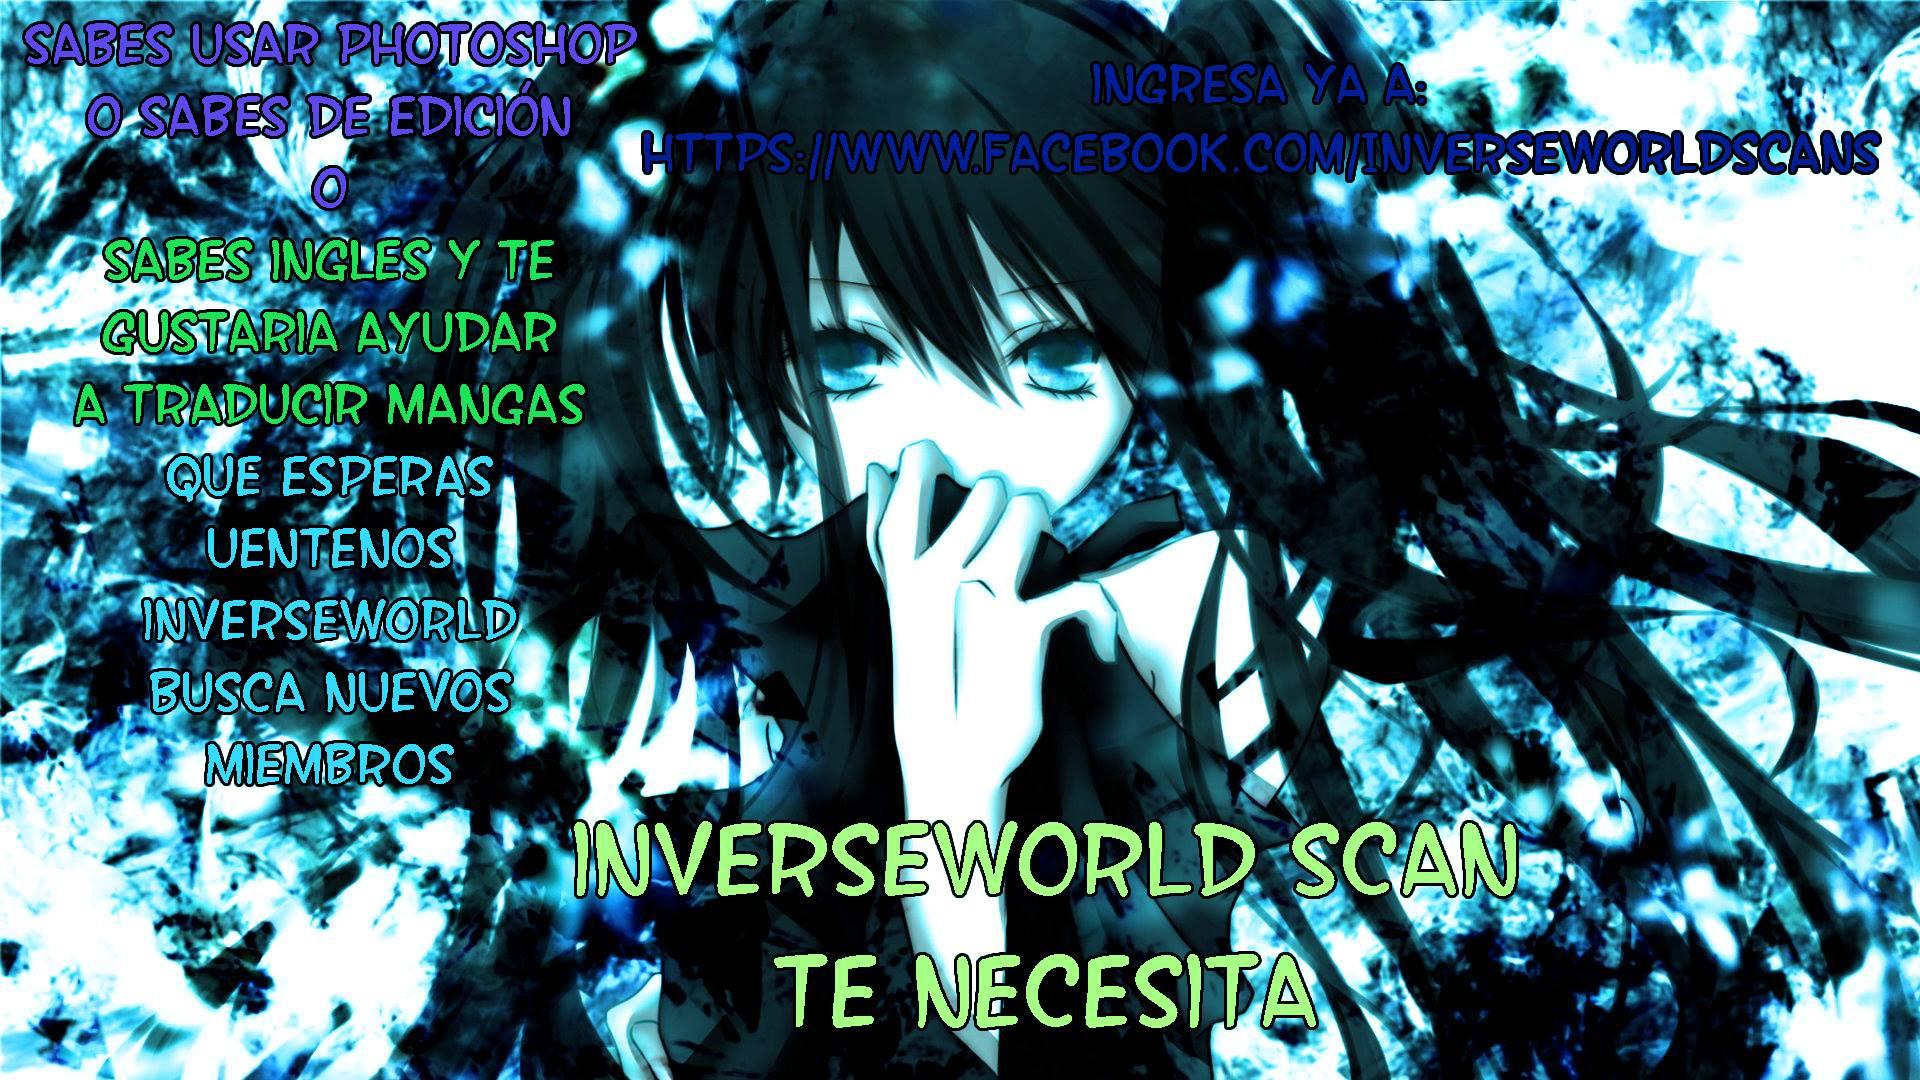 http://c5.ninemanga.com/es_manga/18/16210/415306/d7624597aee42bffe1185d214d50feed.jpg Page 1